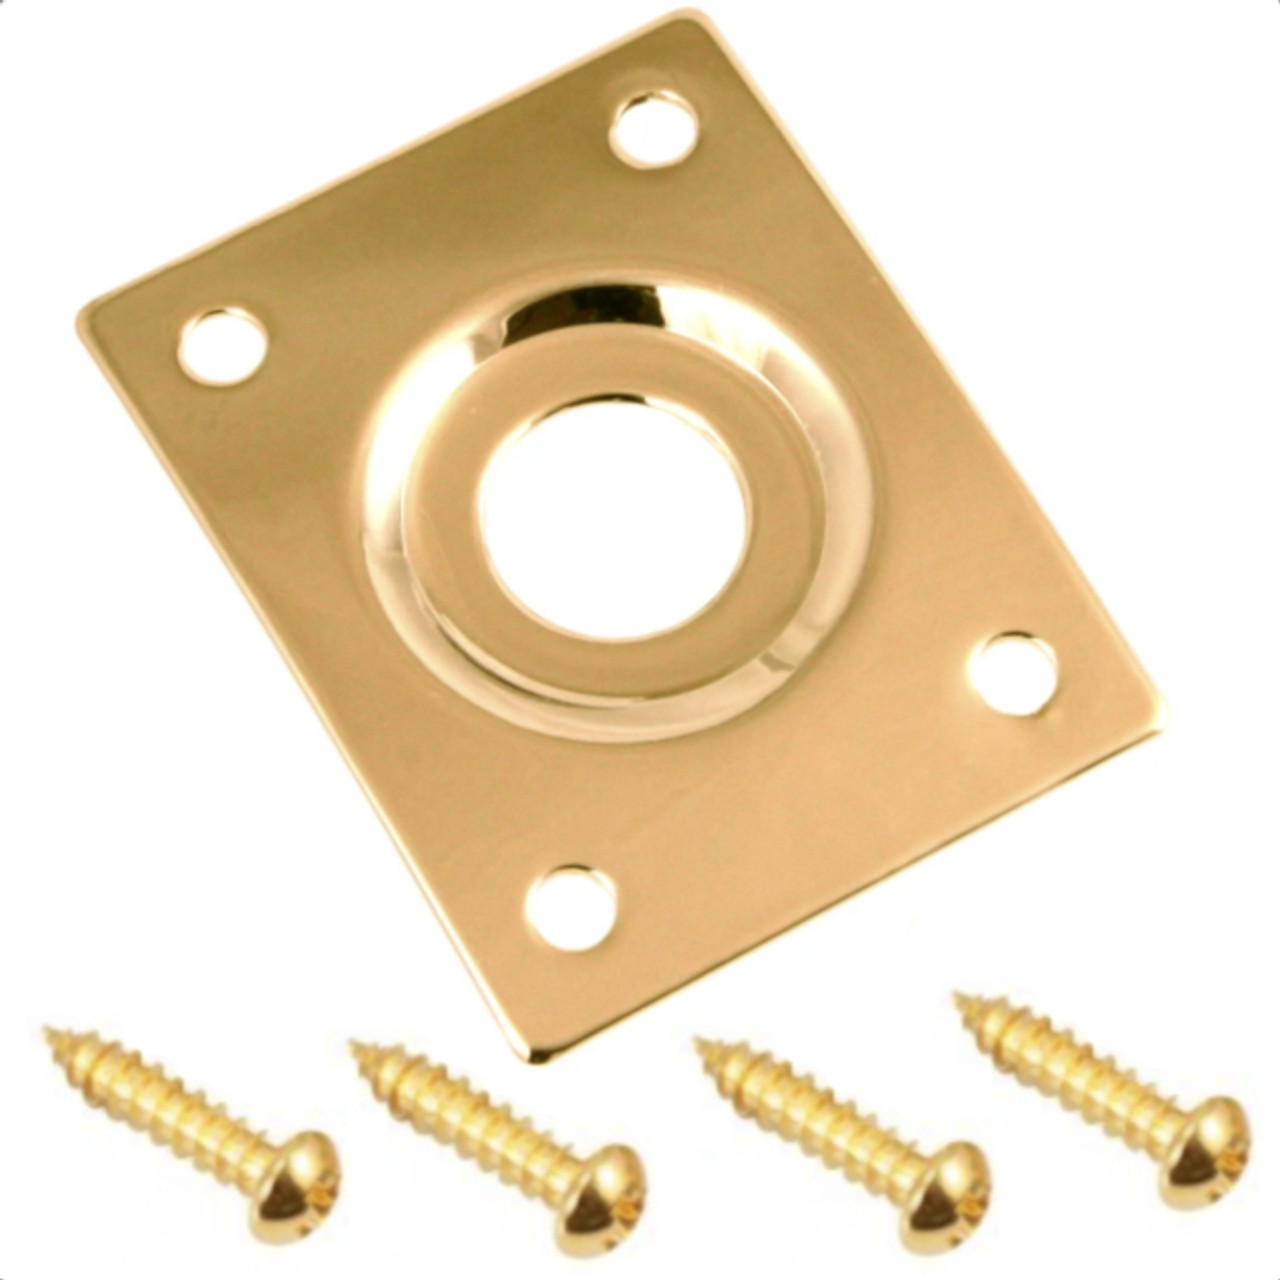 Rectangular Metal Jack Plate-Gold